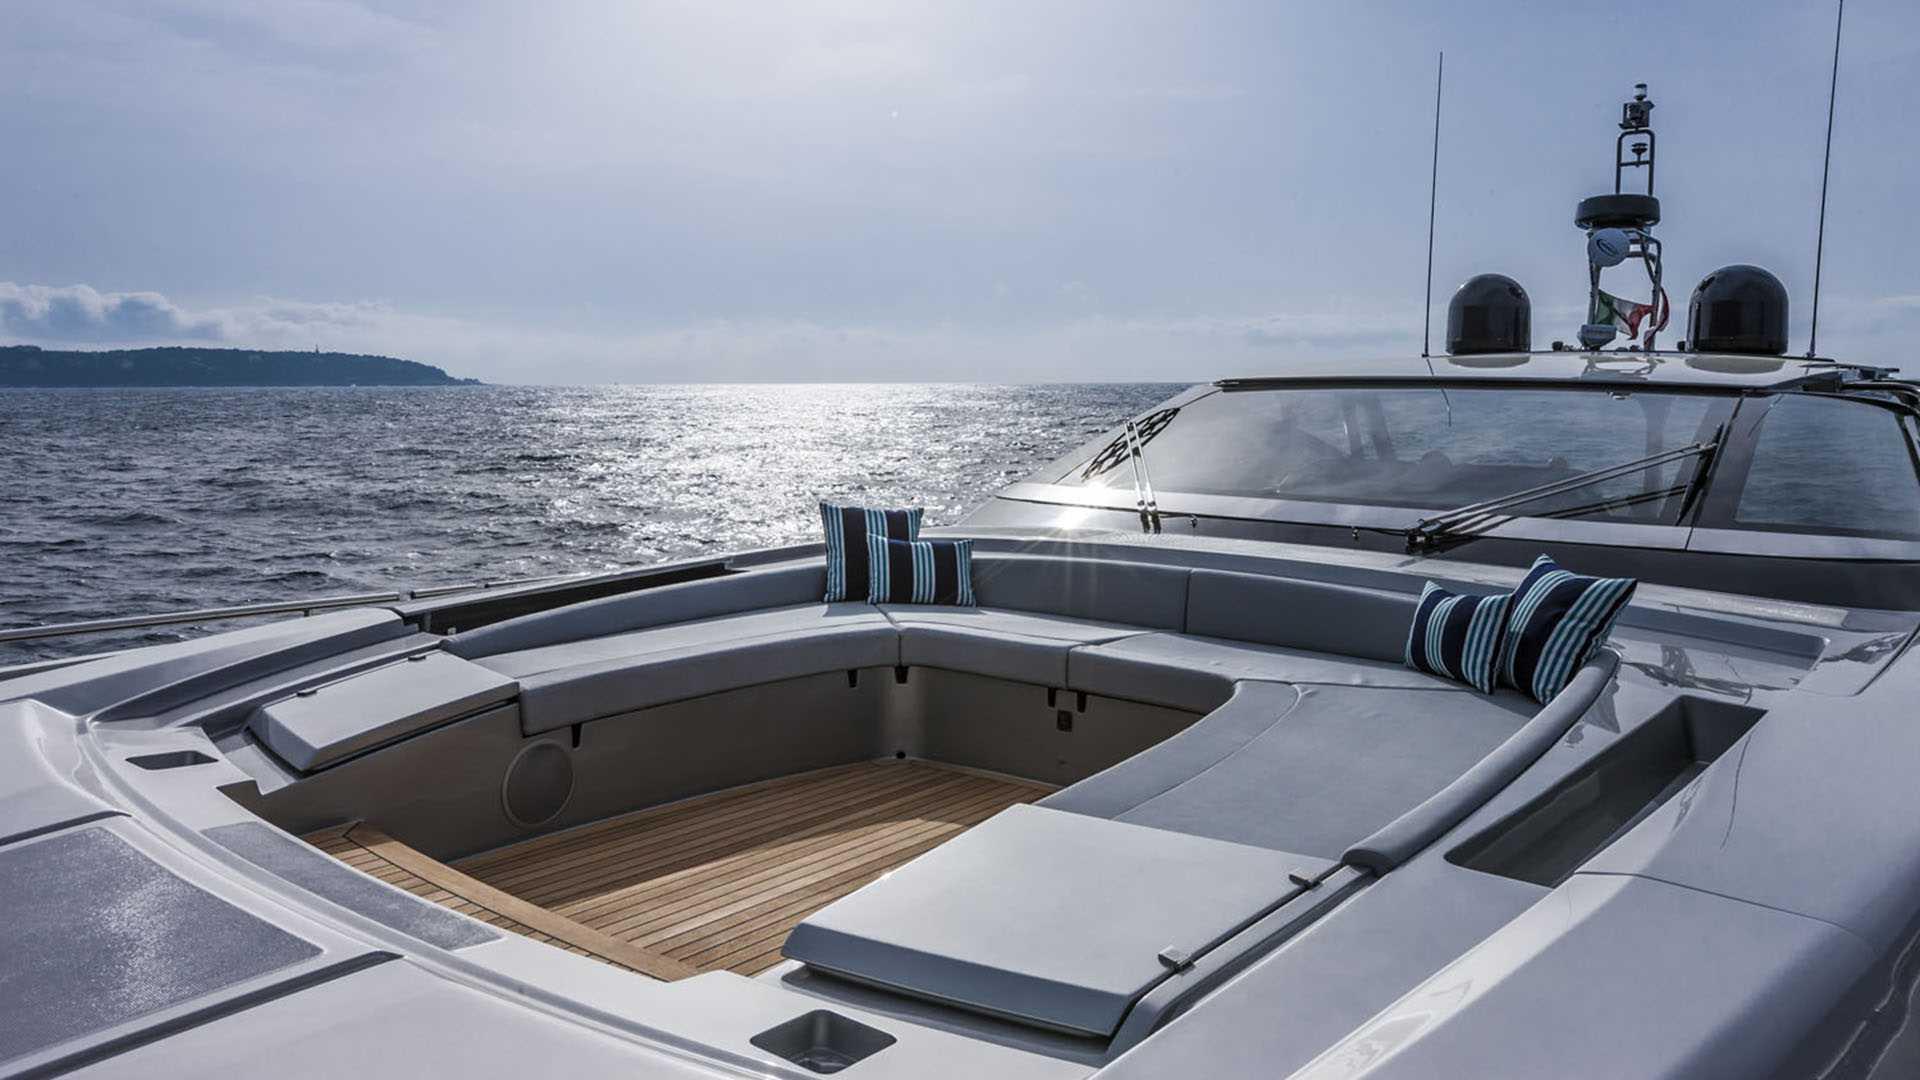 luxusní člun Riva 88 Florida